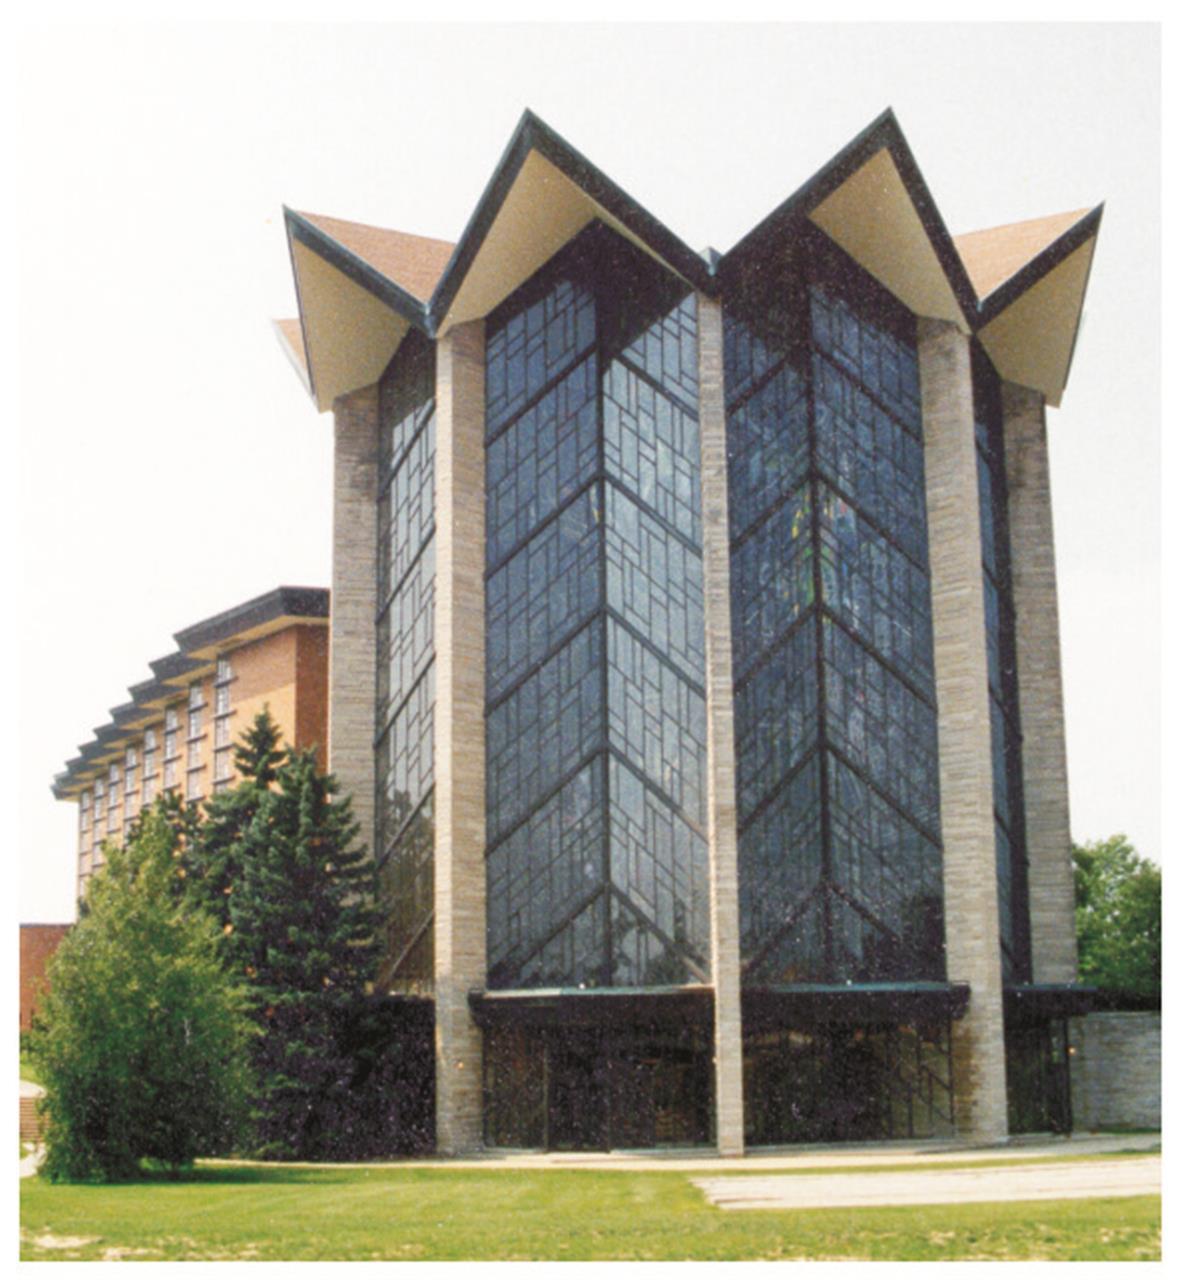 The beautiful Chapel of the Resurrection tower located at Valparaiso University in Valparaiso, Indiana.